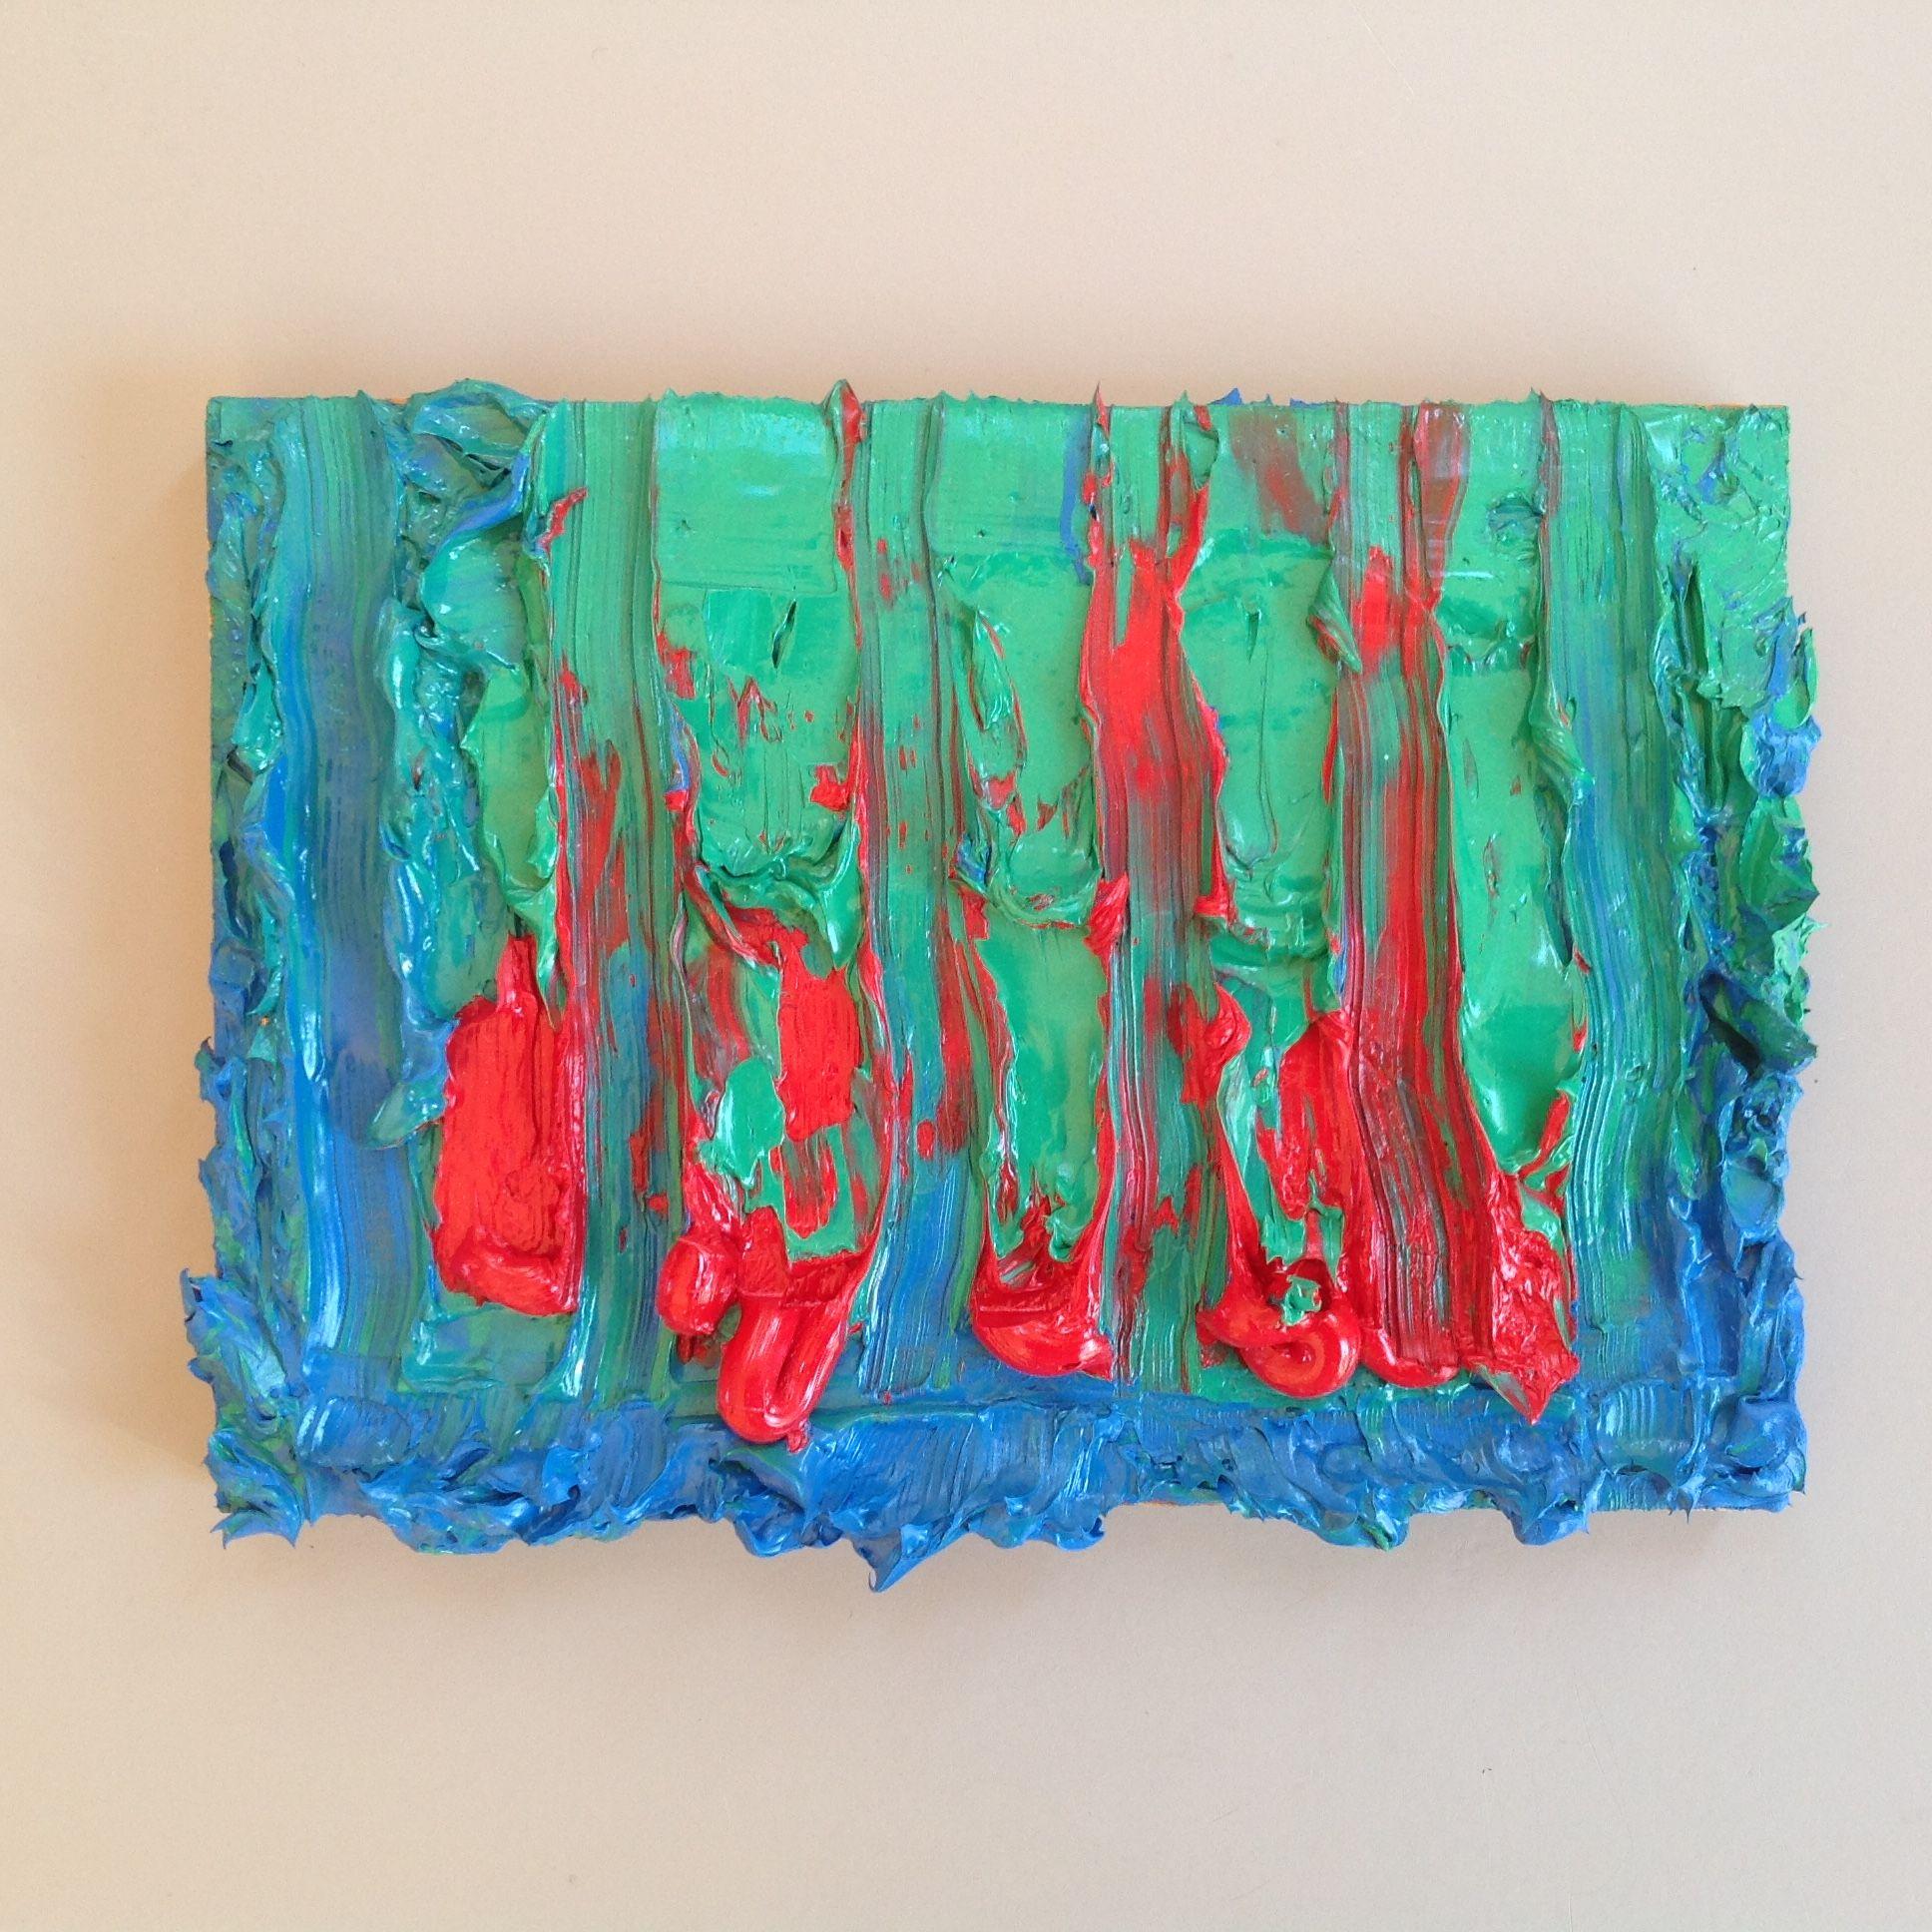 Riny Van Cleef, Oktober 2014, olieverf, 14 x 20 cm.